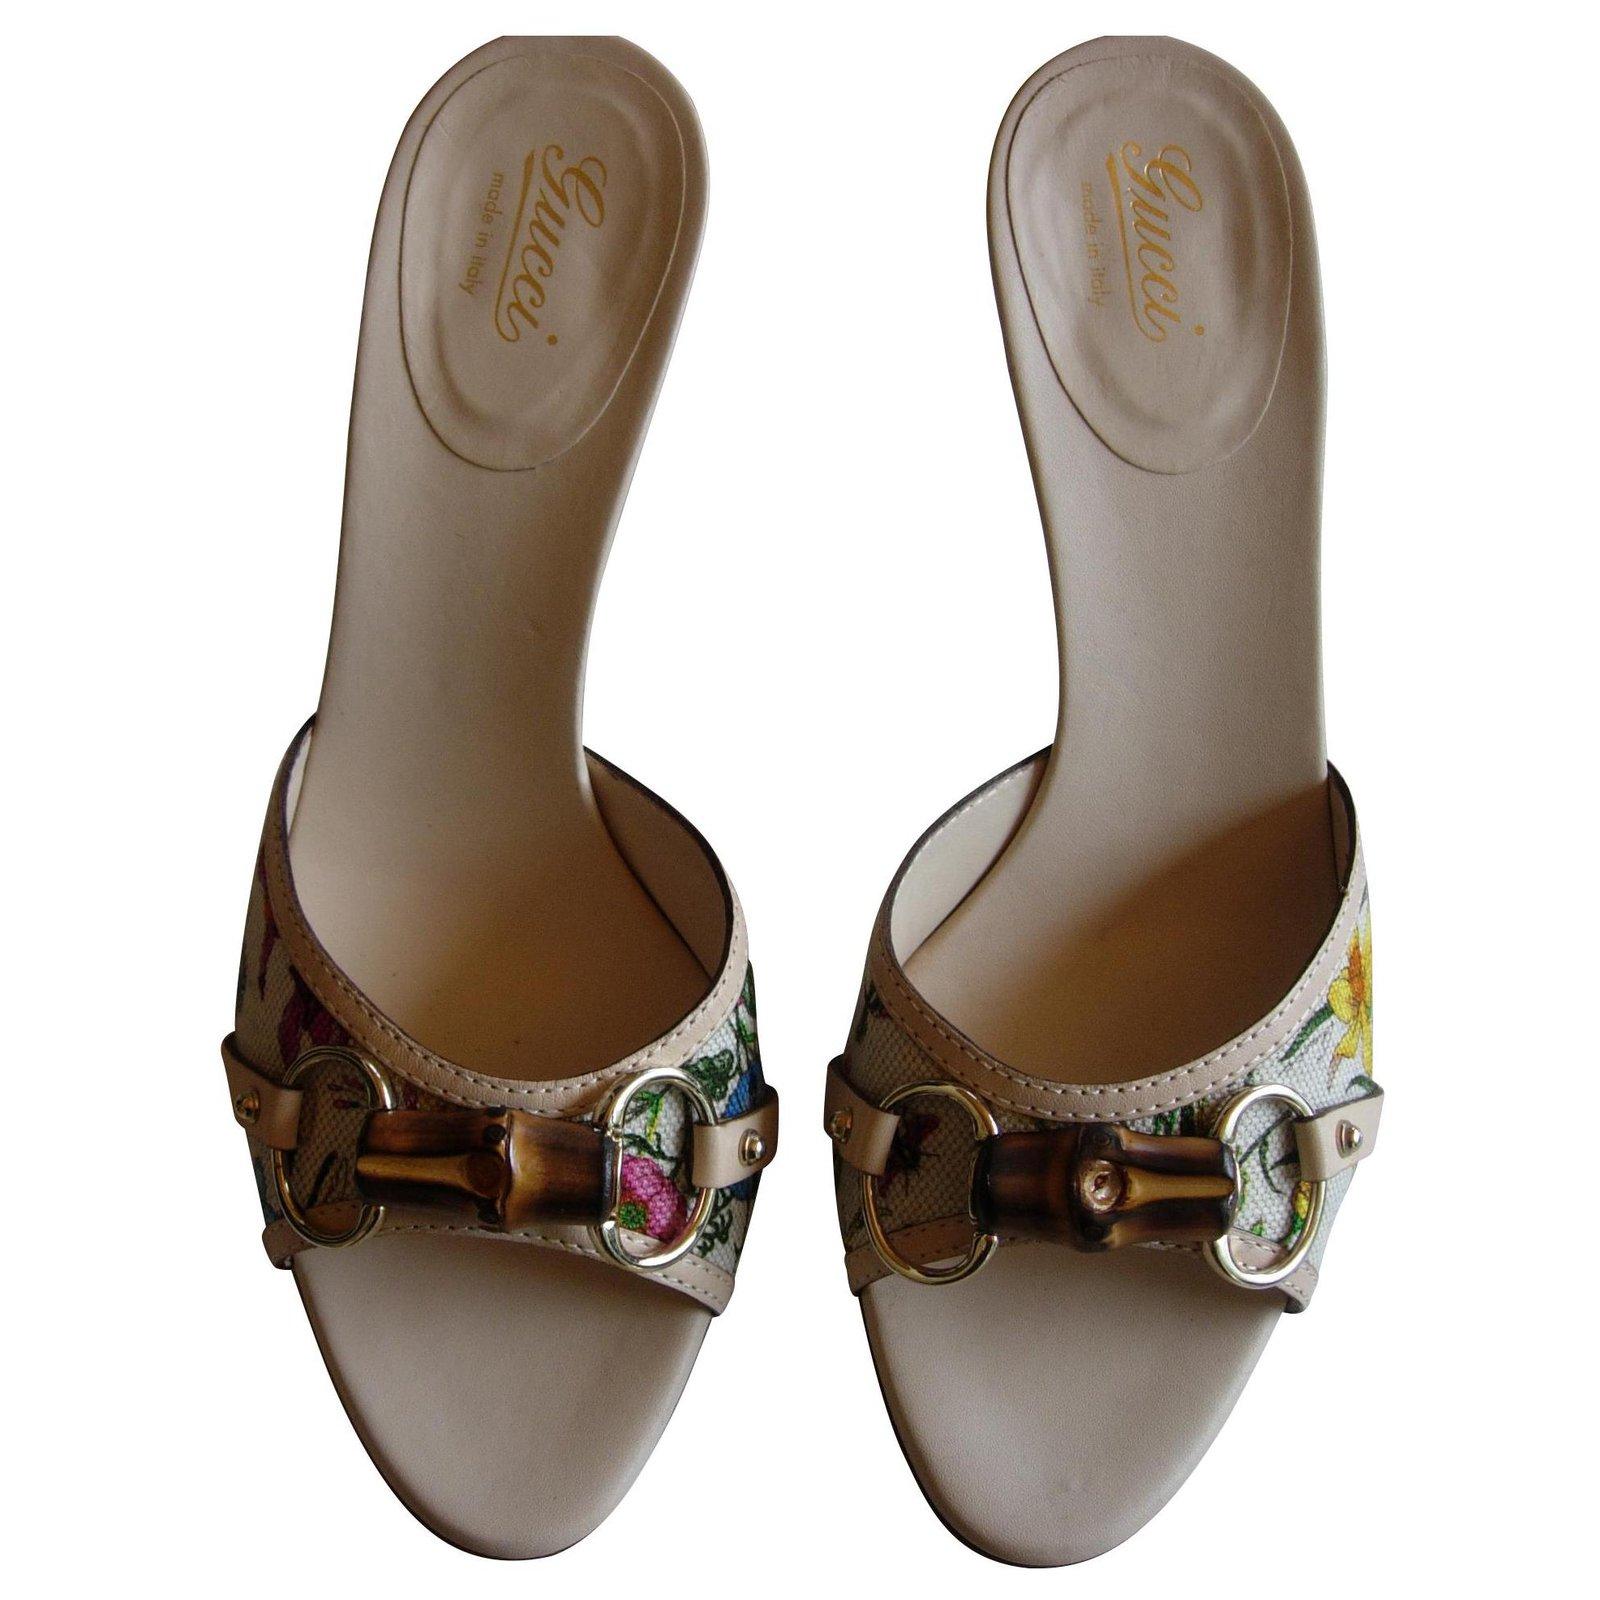 b3d43923471 Gucci Gucci Flora bamboo Mules Leather